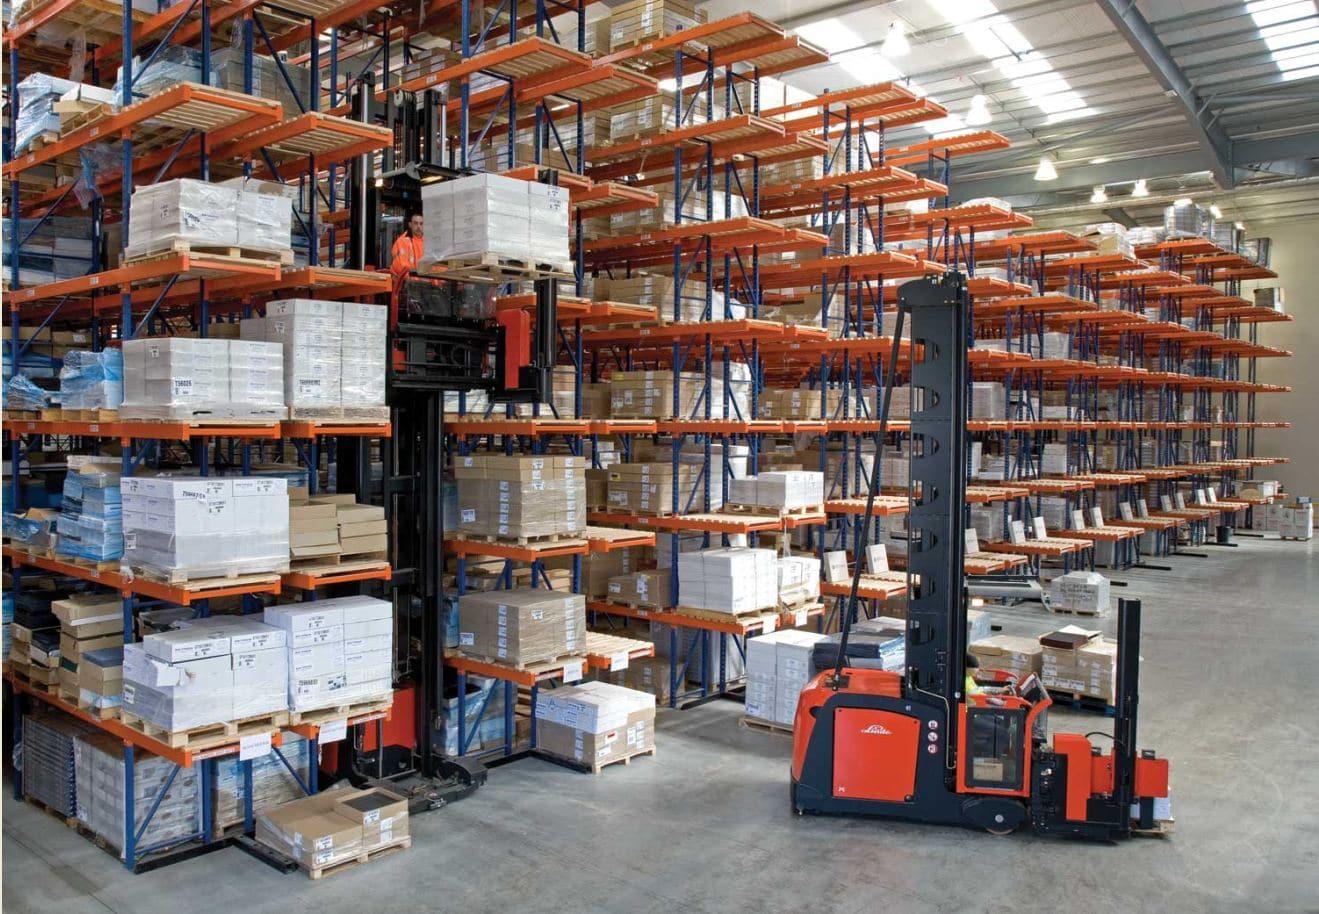 Redirack Very Narrow Aisle Racks installed in Lansdon's Distribution facility